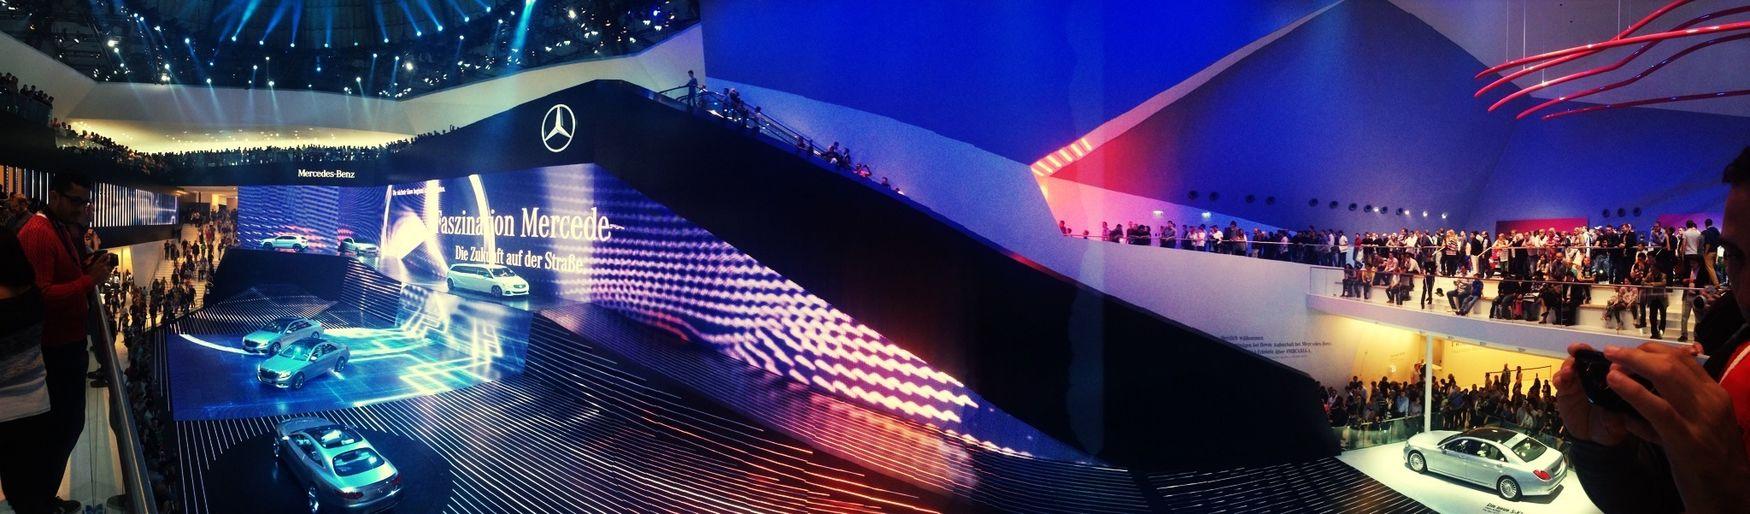 Panorama Landscape Iaa Mercedes